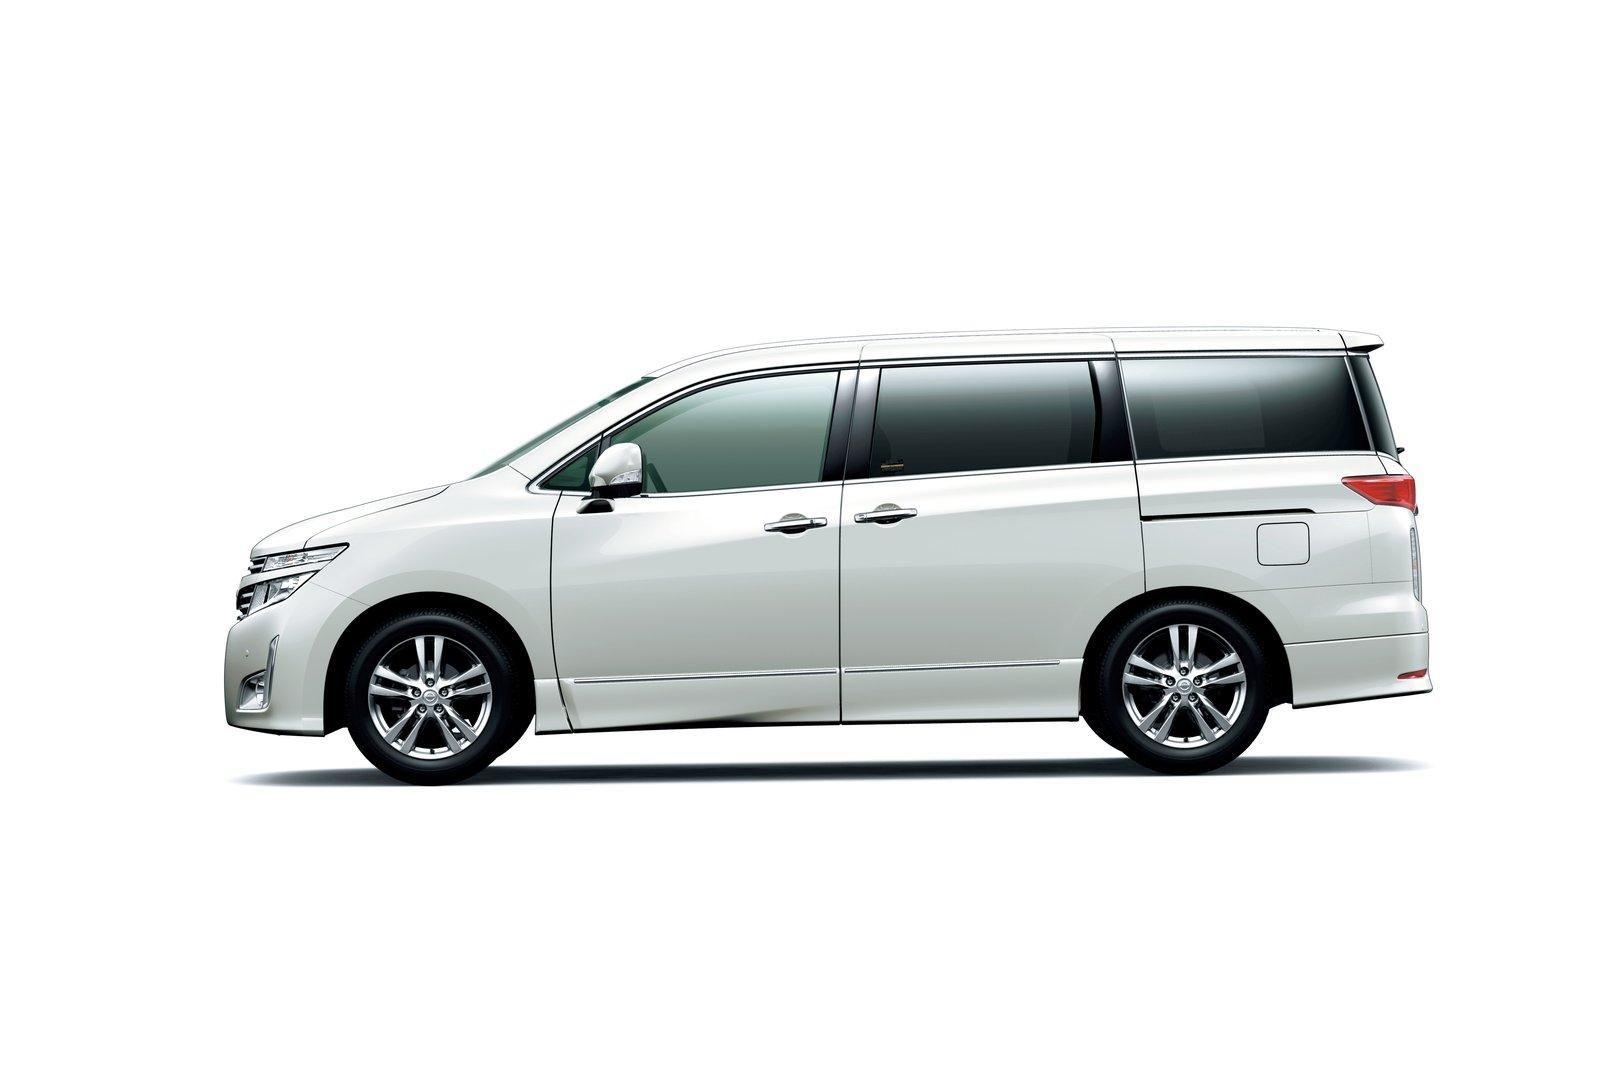 nissan quest the minivan club pinterest nissan minivan and rear seat. Black Bedroom Furniture Sets. Home Design Ideas